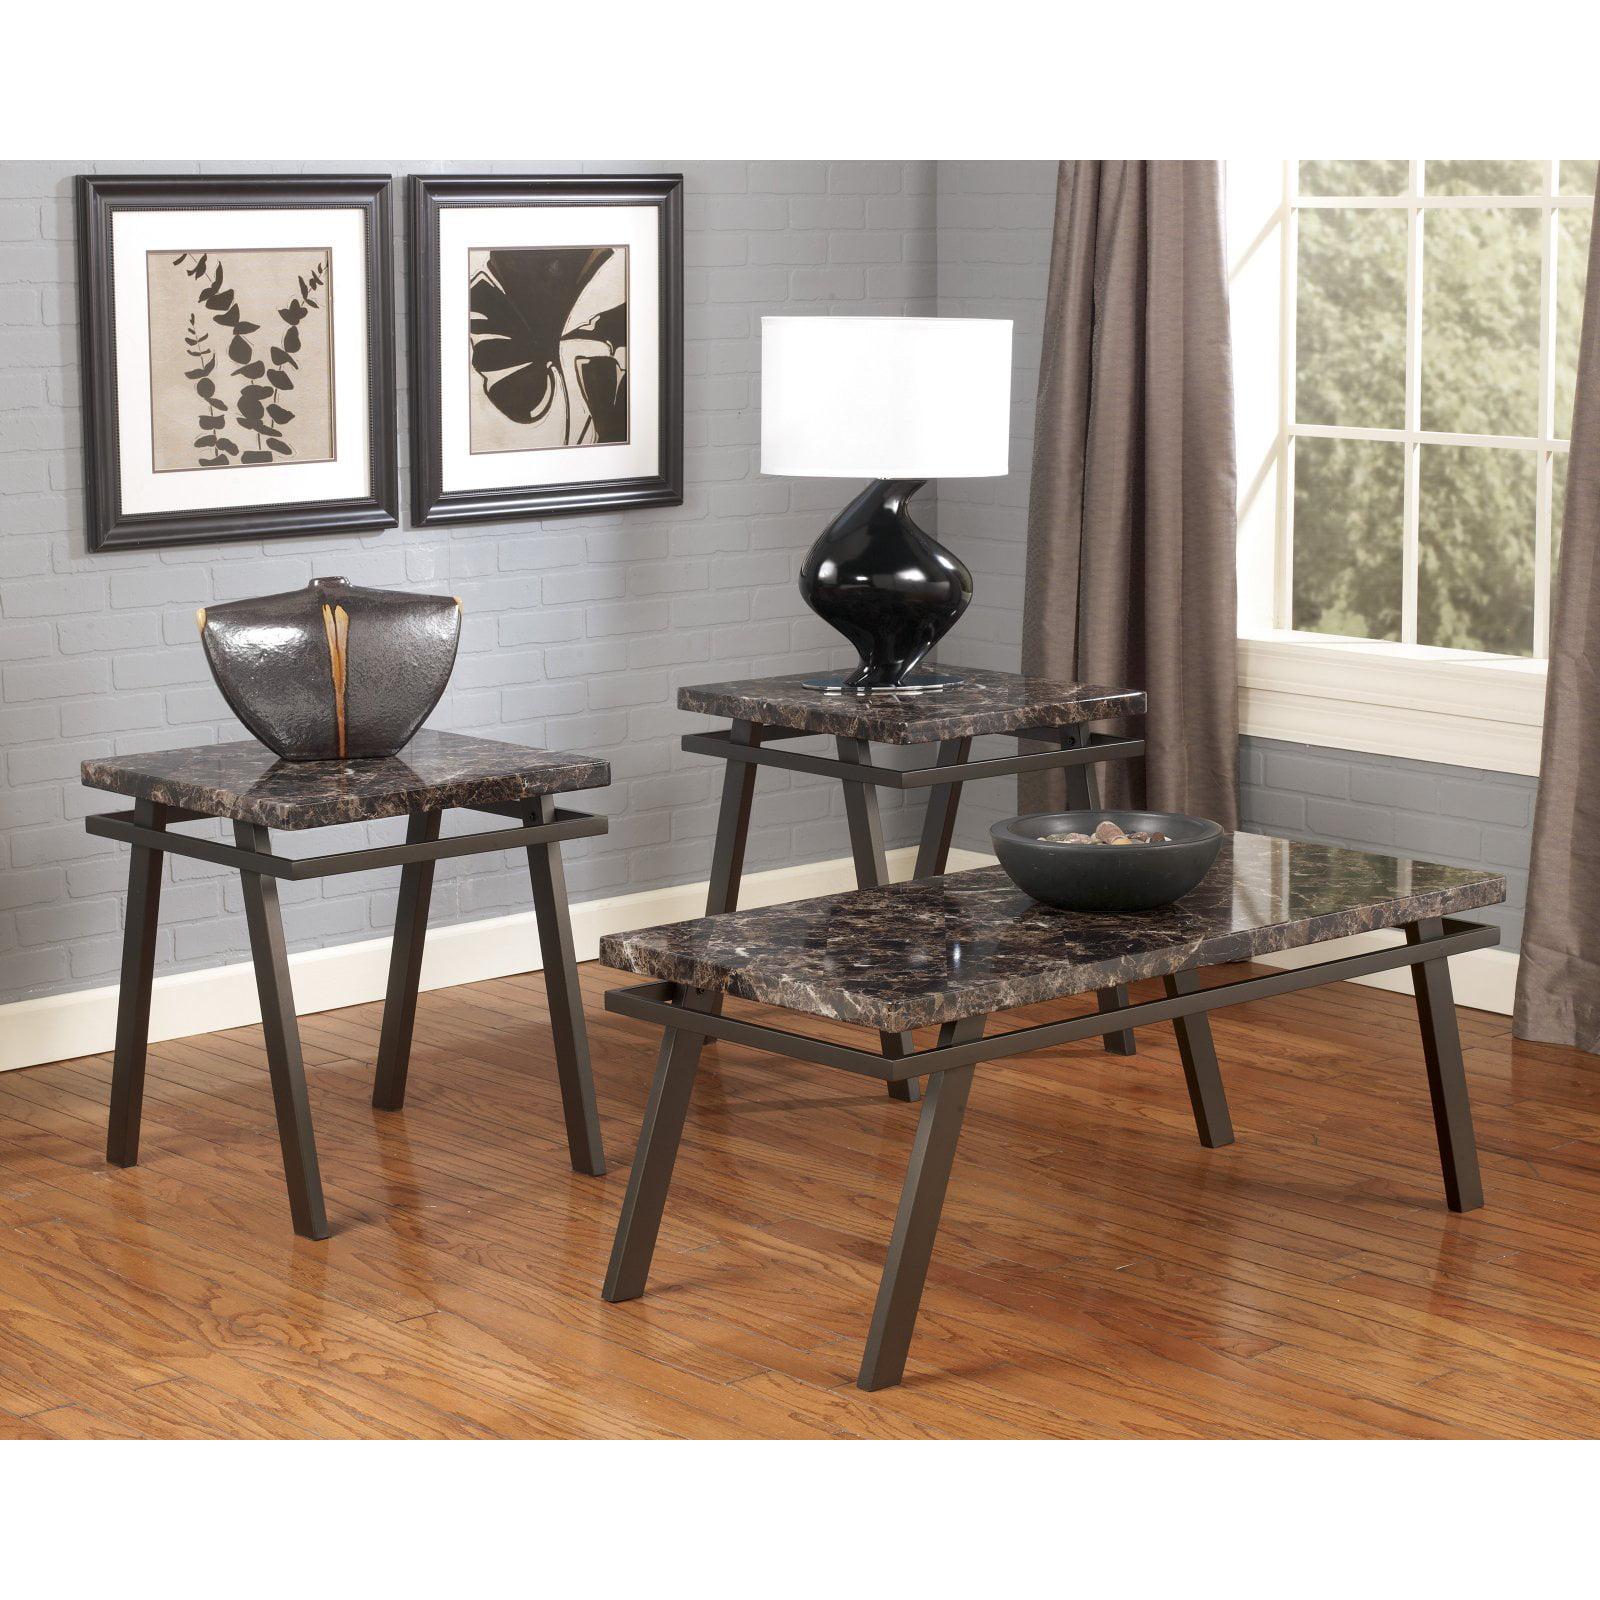 Signature Design by Ashley Paintsville 3 Piece Coffee Table Set